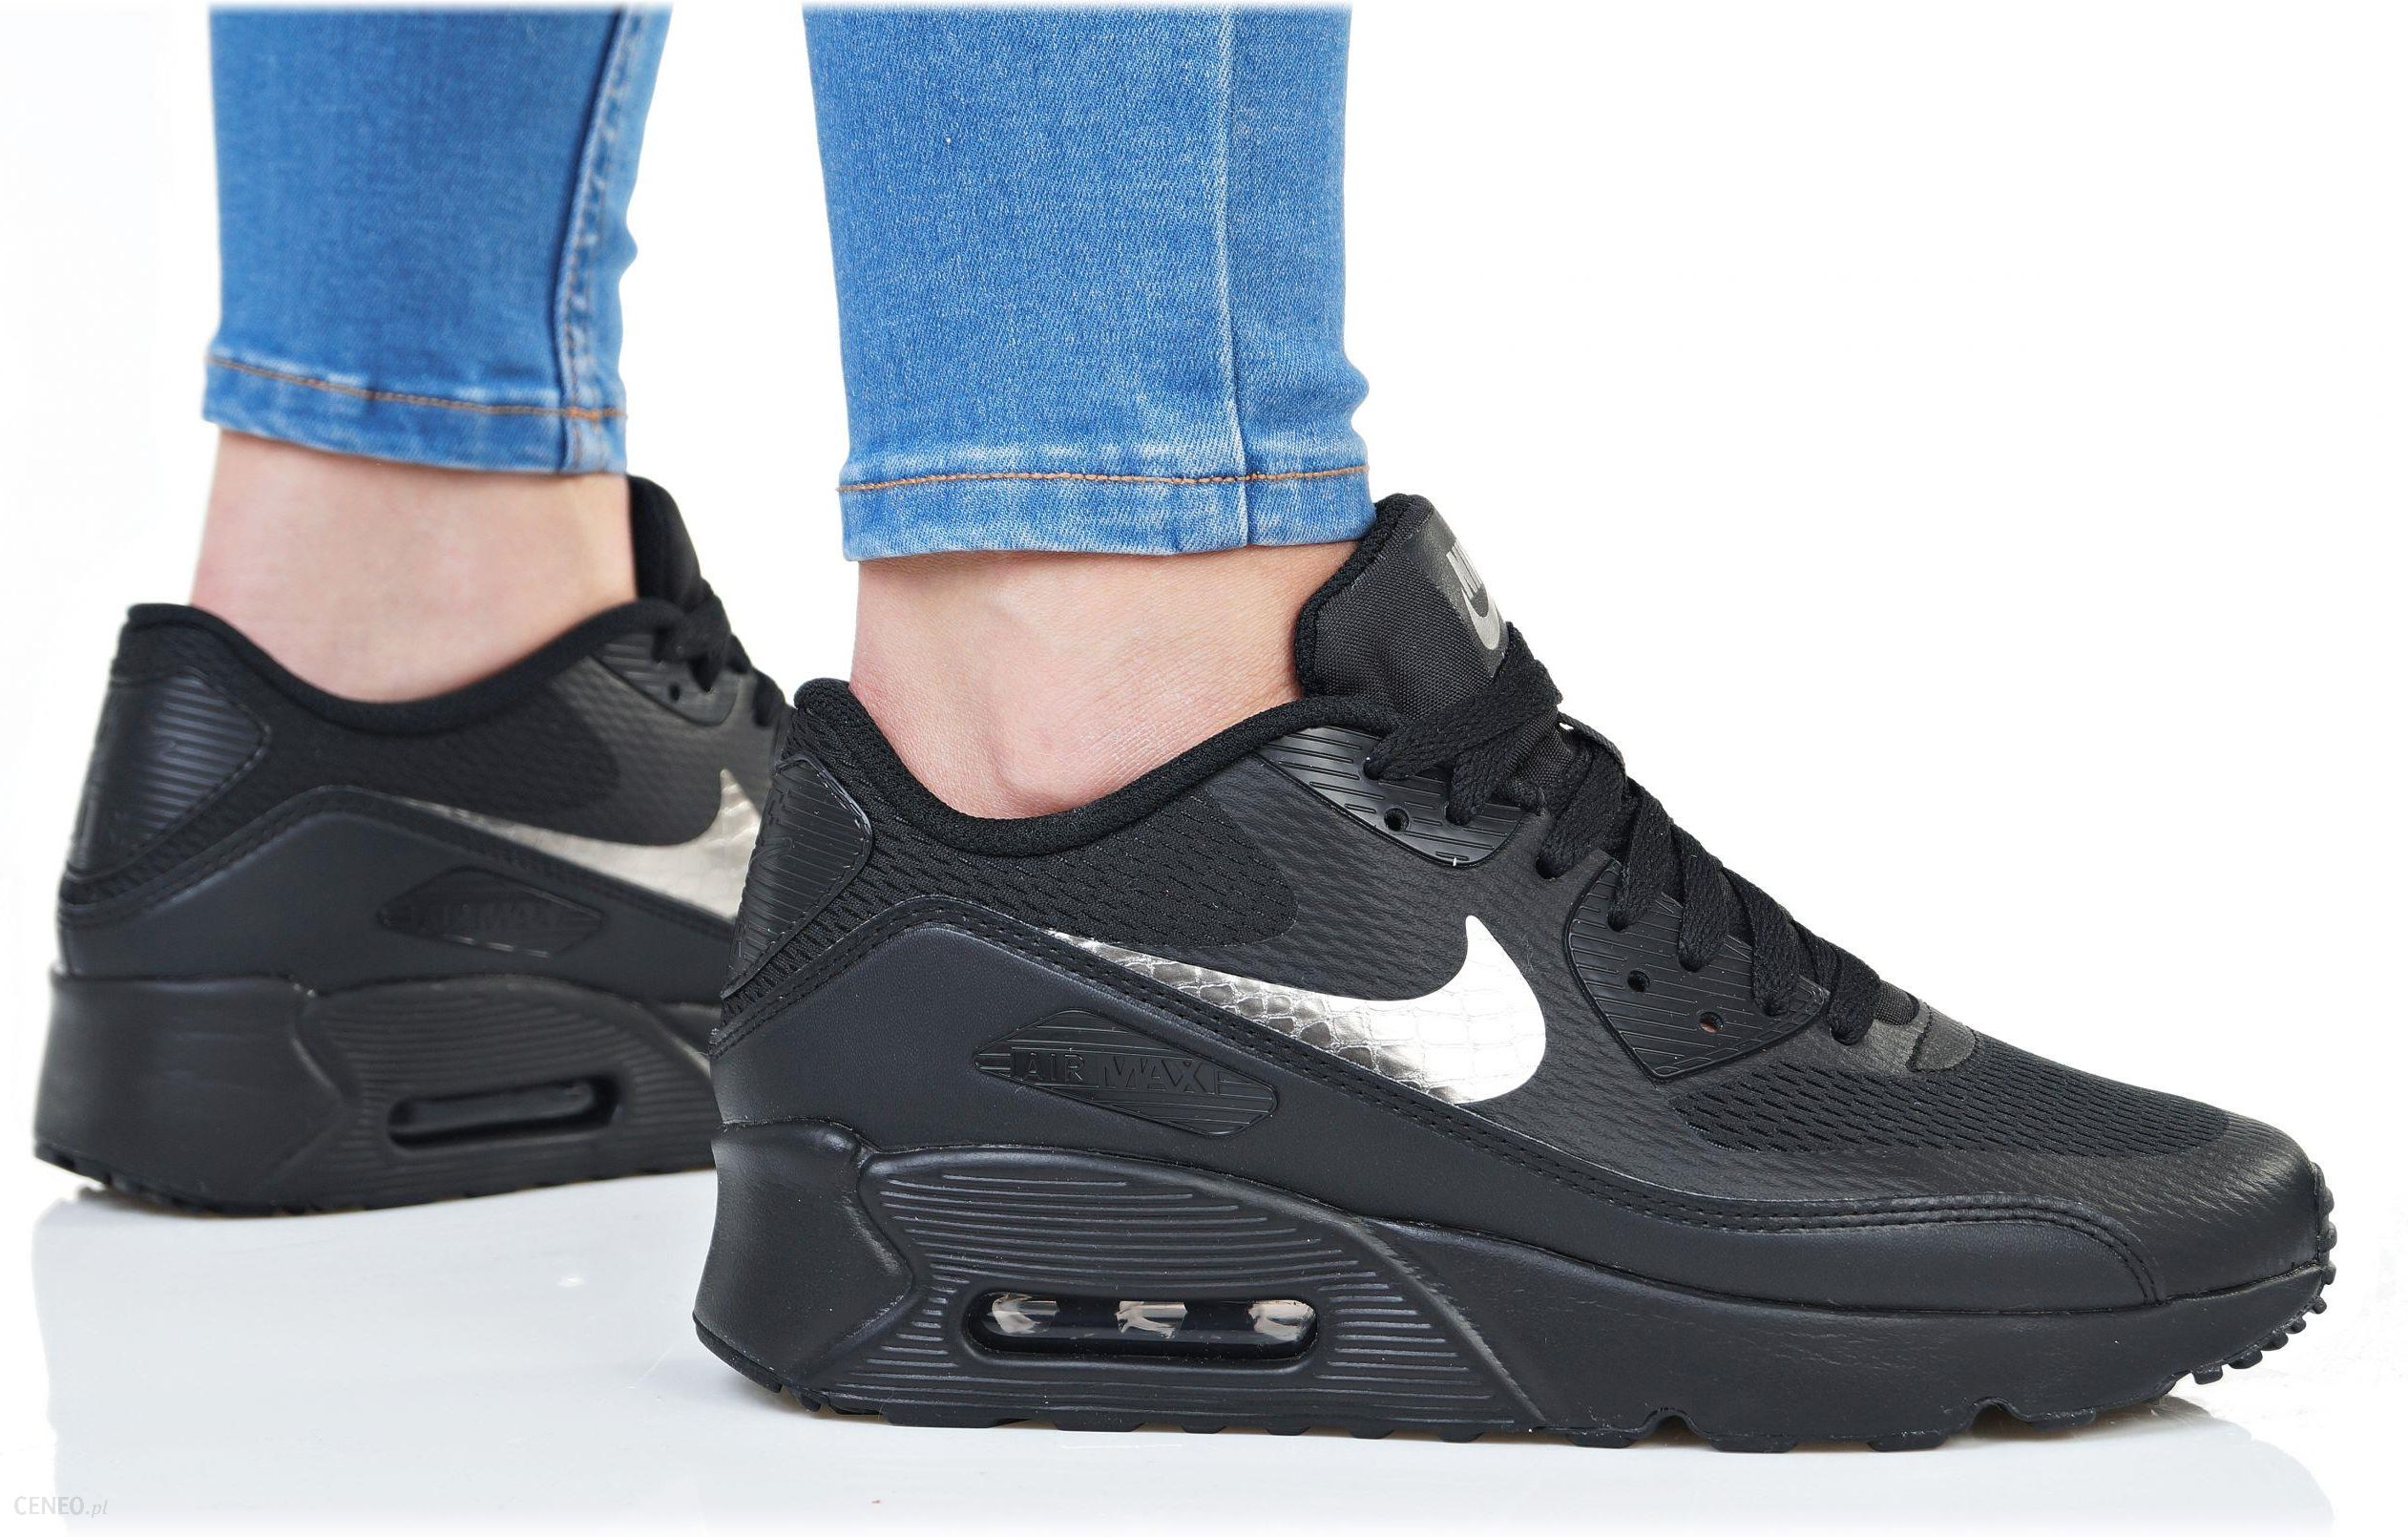 Buty Nike Air Max 90 Ultra 2.0 869950 001 r. 40 Ceny i opinie Ceneo.pl